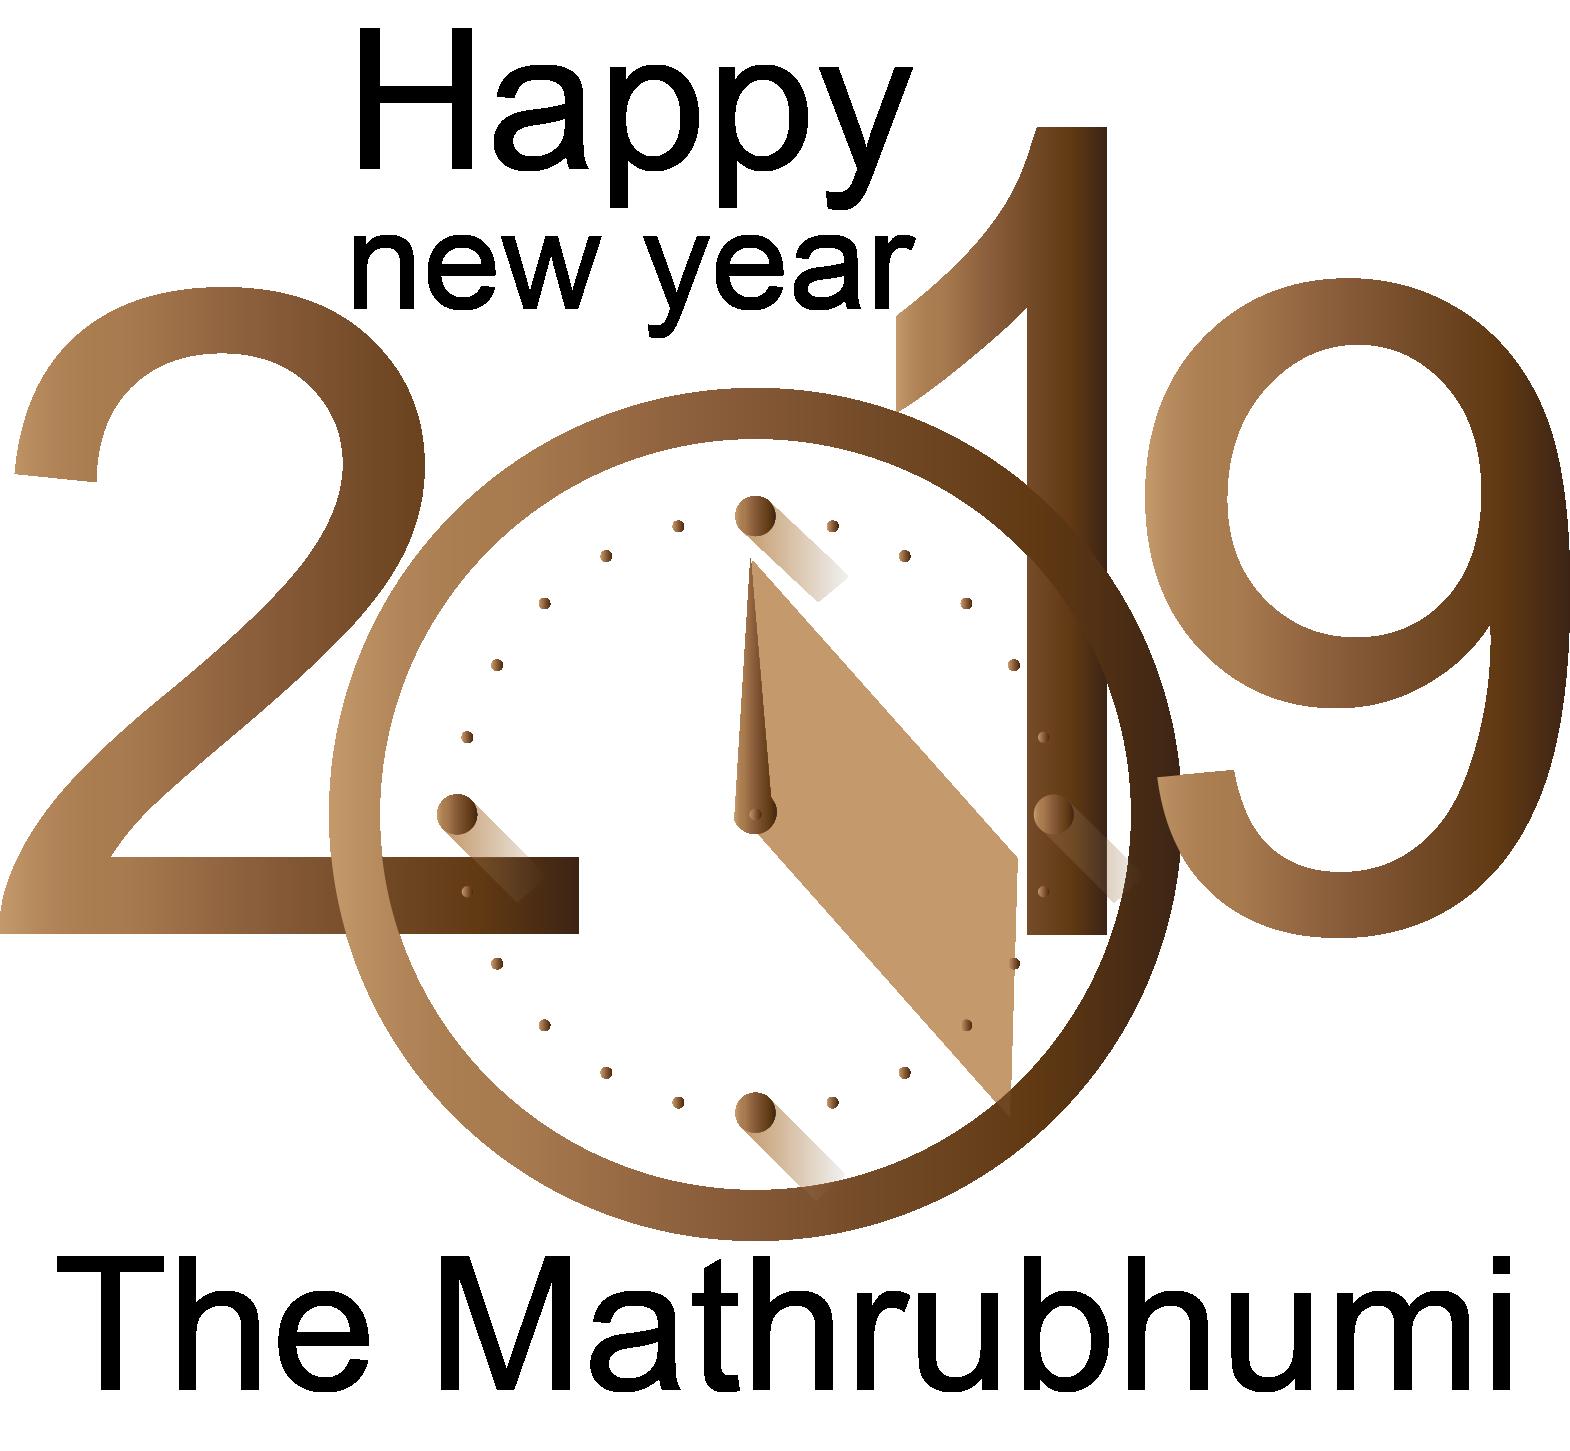 Happy_new_year vijeshviswam Happy new year, Happy